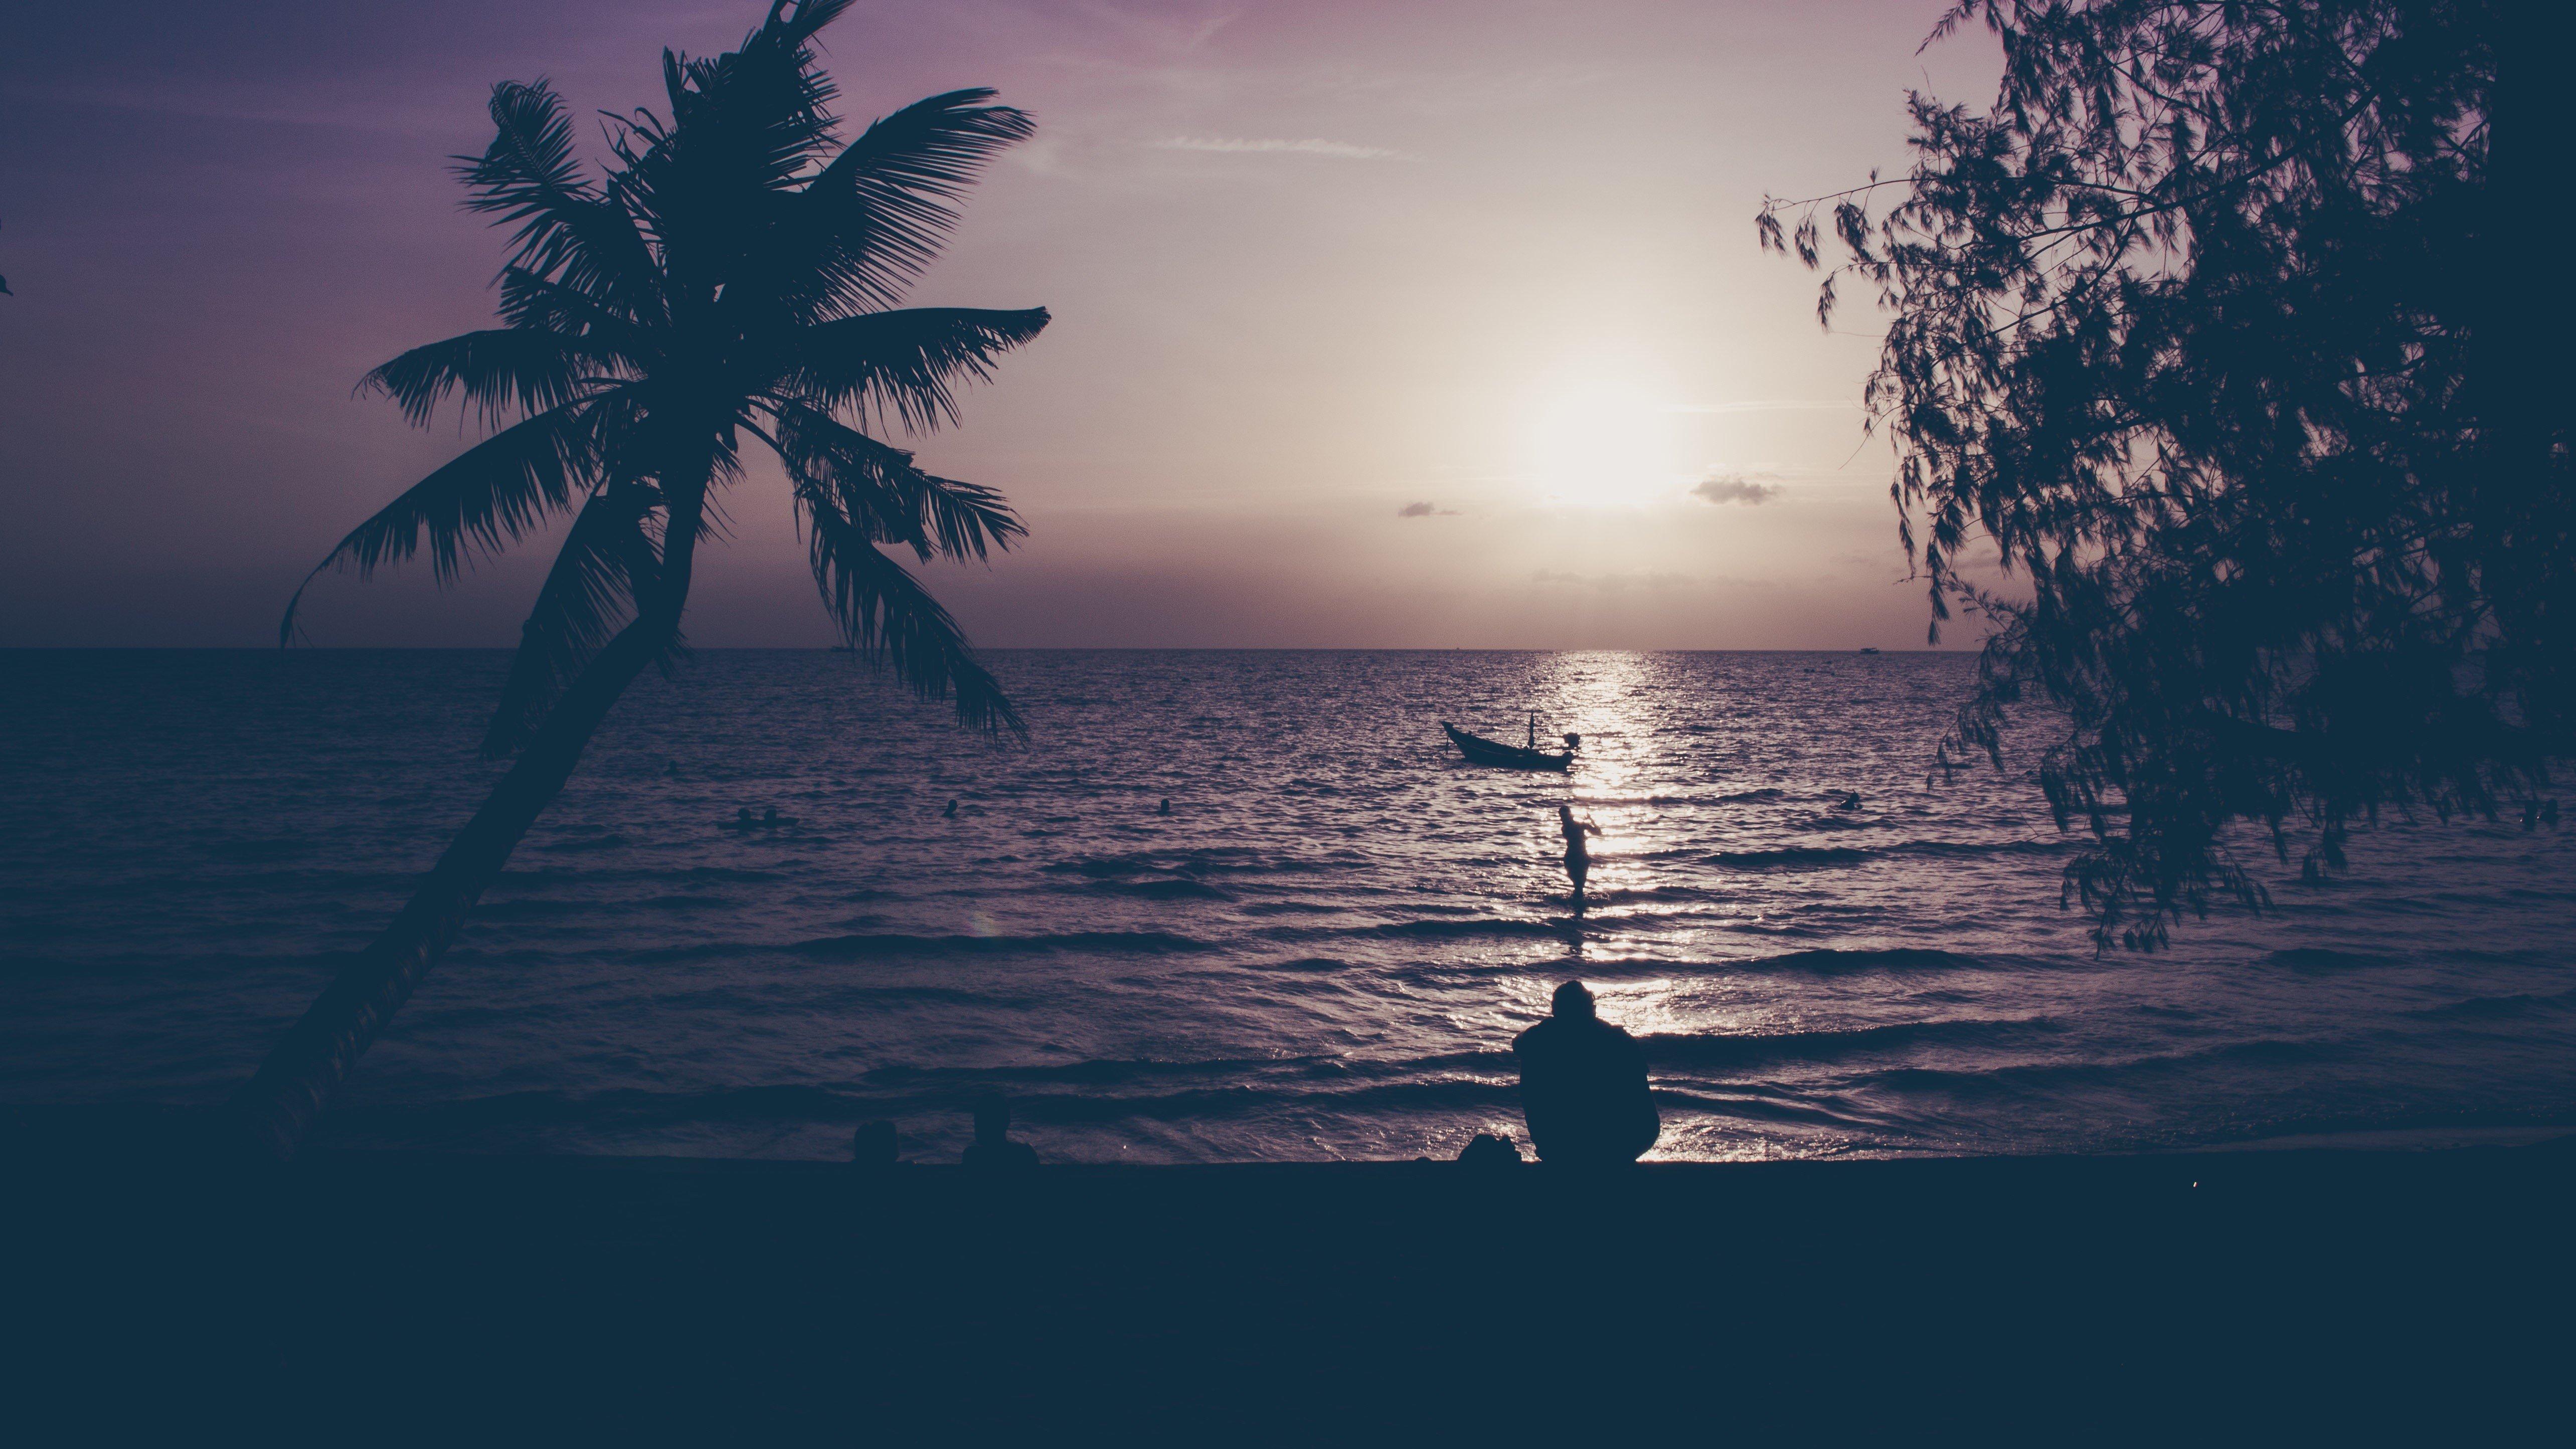 nature, Water, Trees, Sunset, Sun Wallpaper